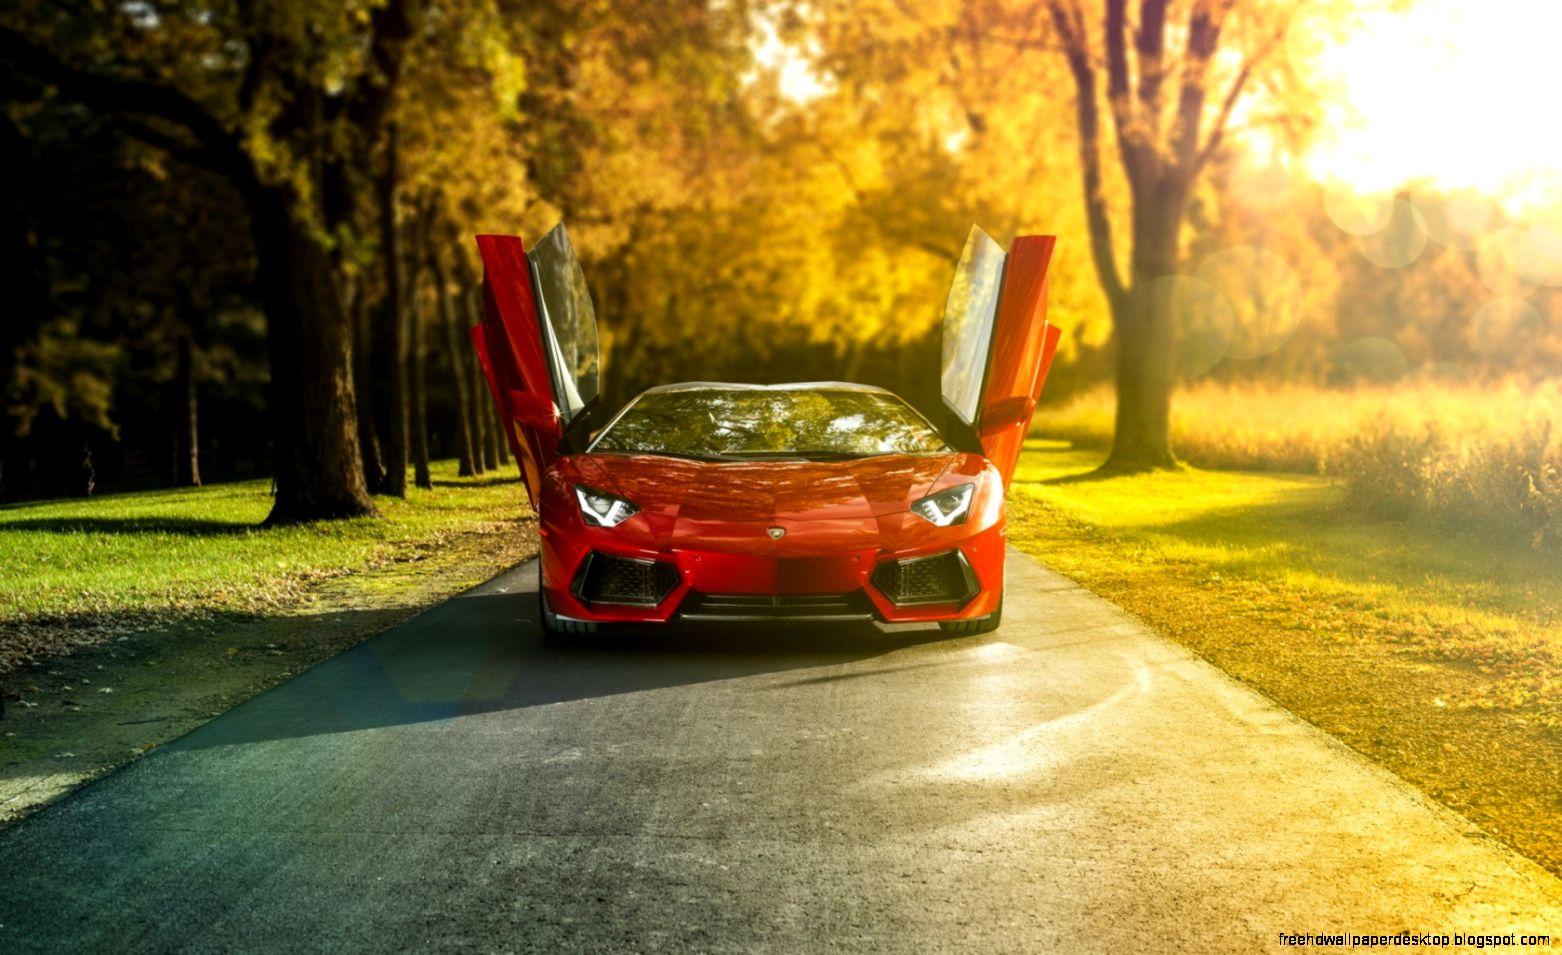 Lamborghini Aventador LP 700 4 Roadster Supercar Road Light 7010190